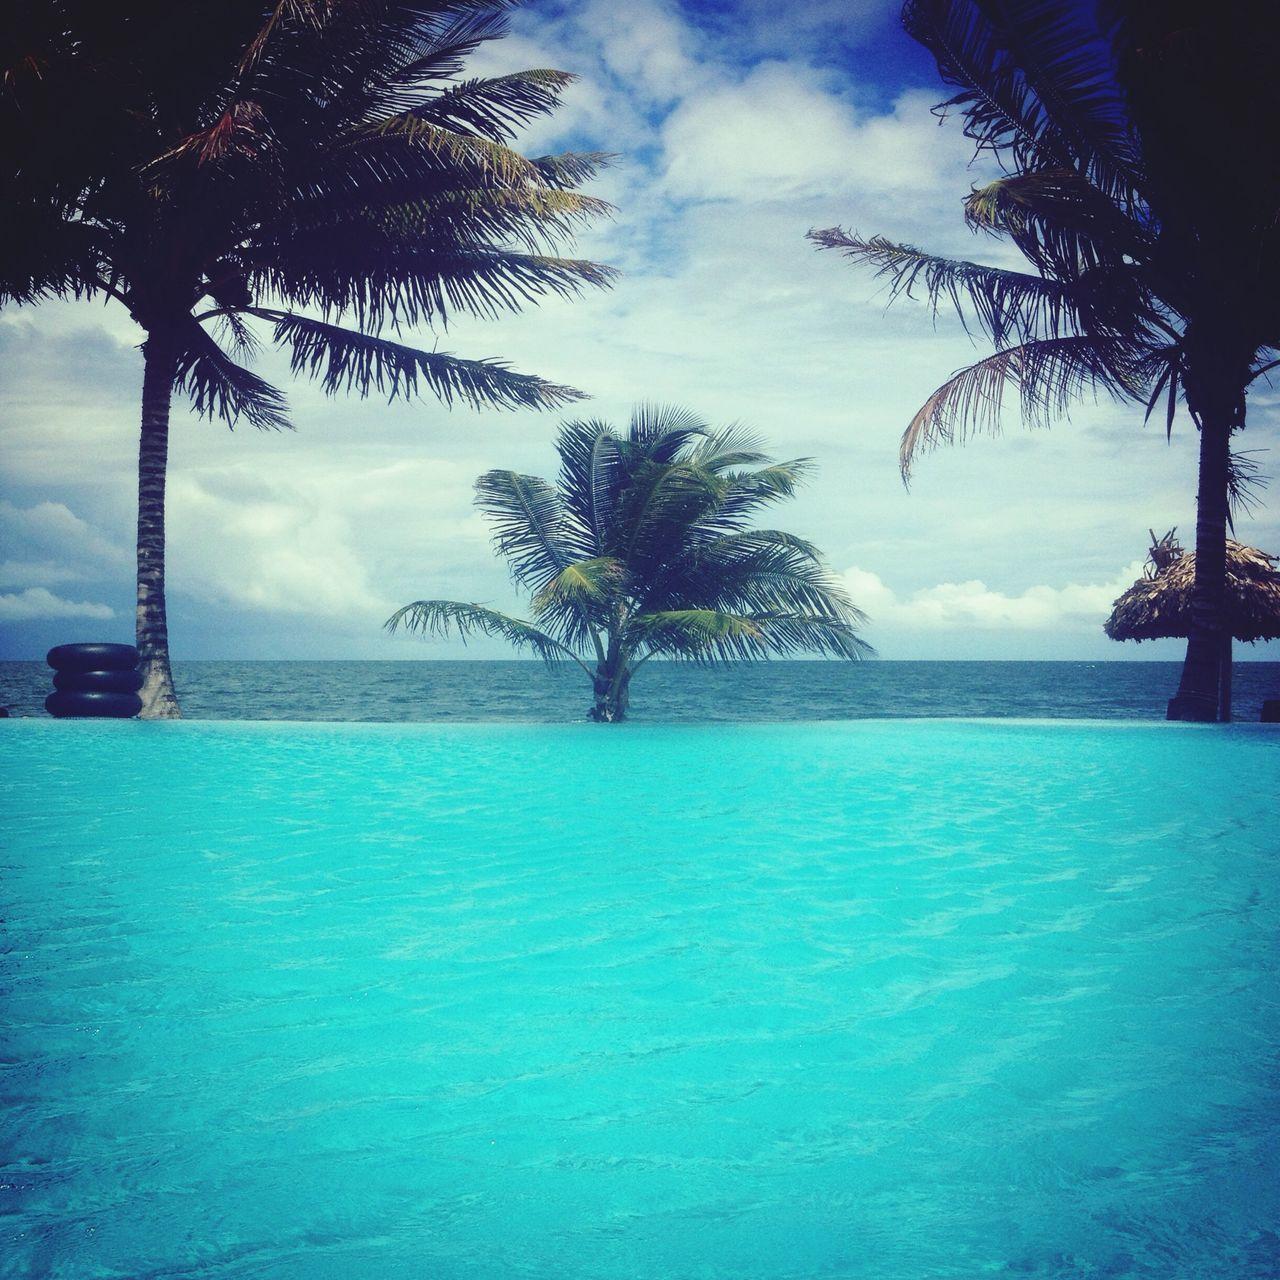 Infinity Pool By Sea